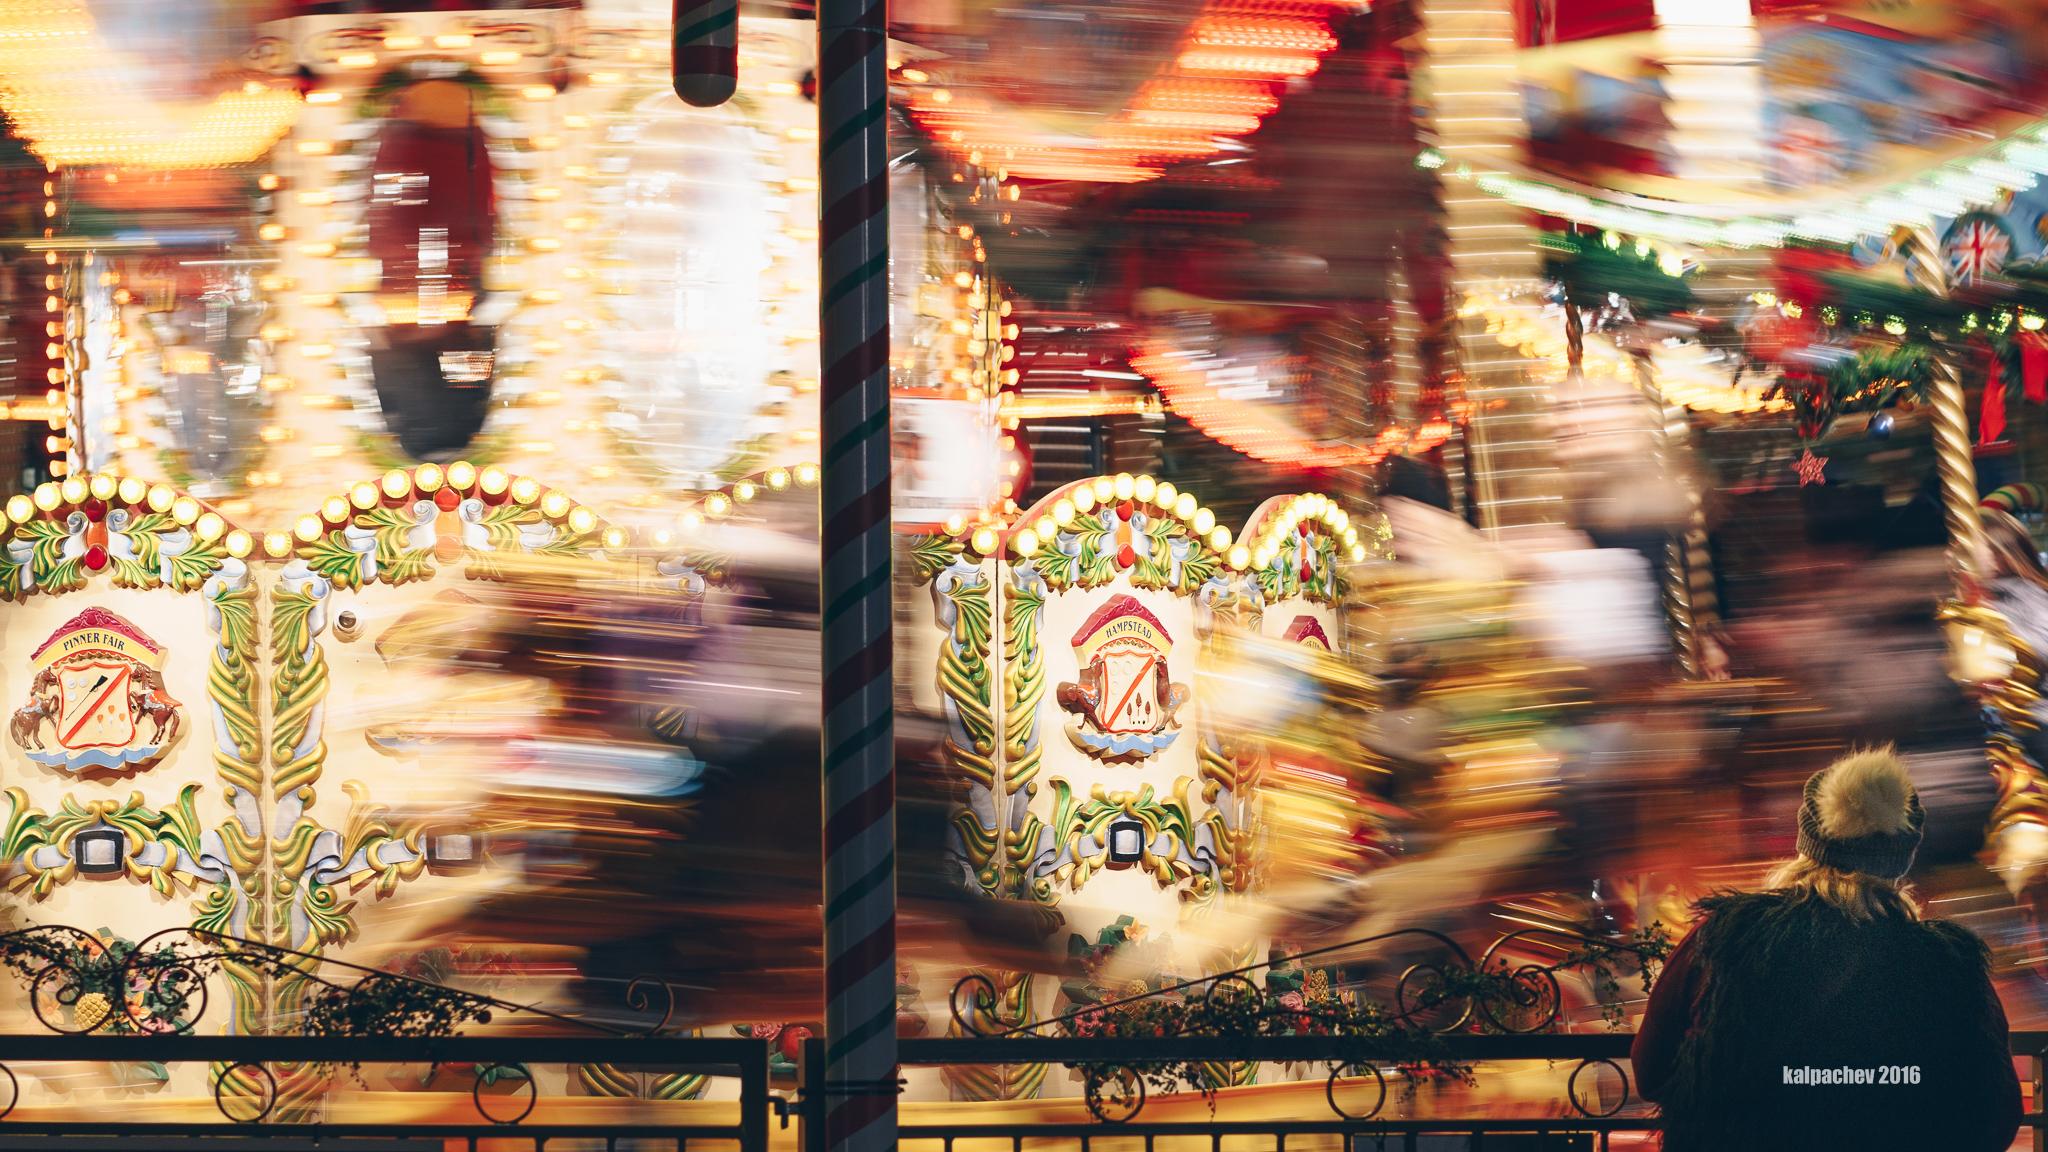 Carousel London 18 Dec 2016